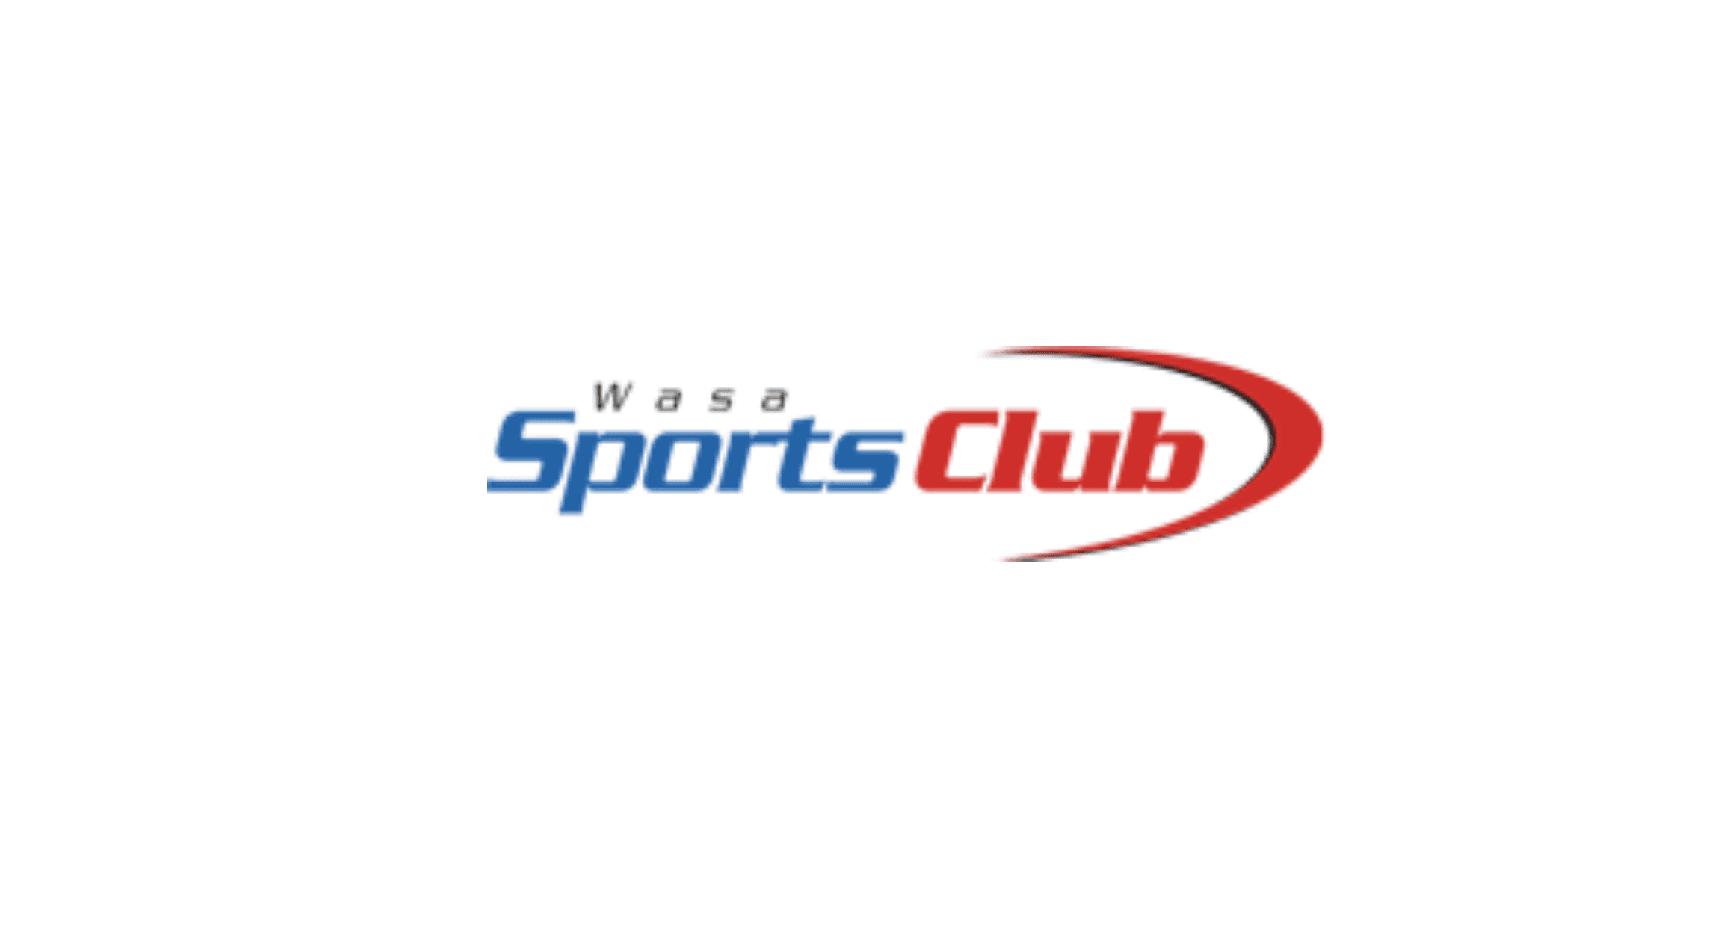 Wasa sports club Ladies club & spa